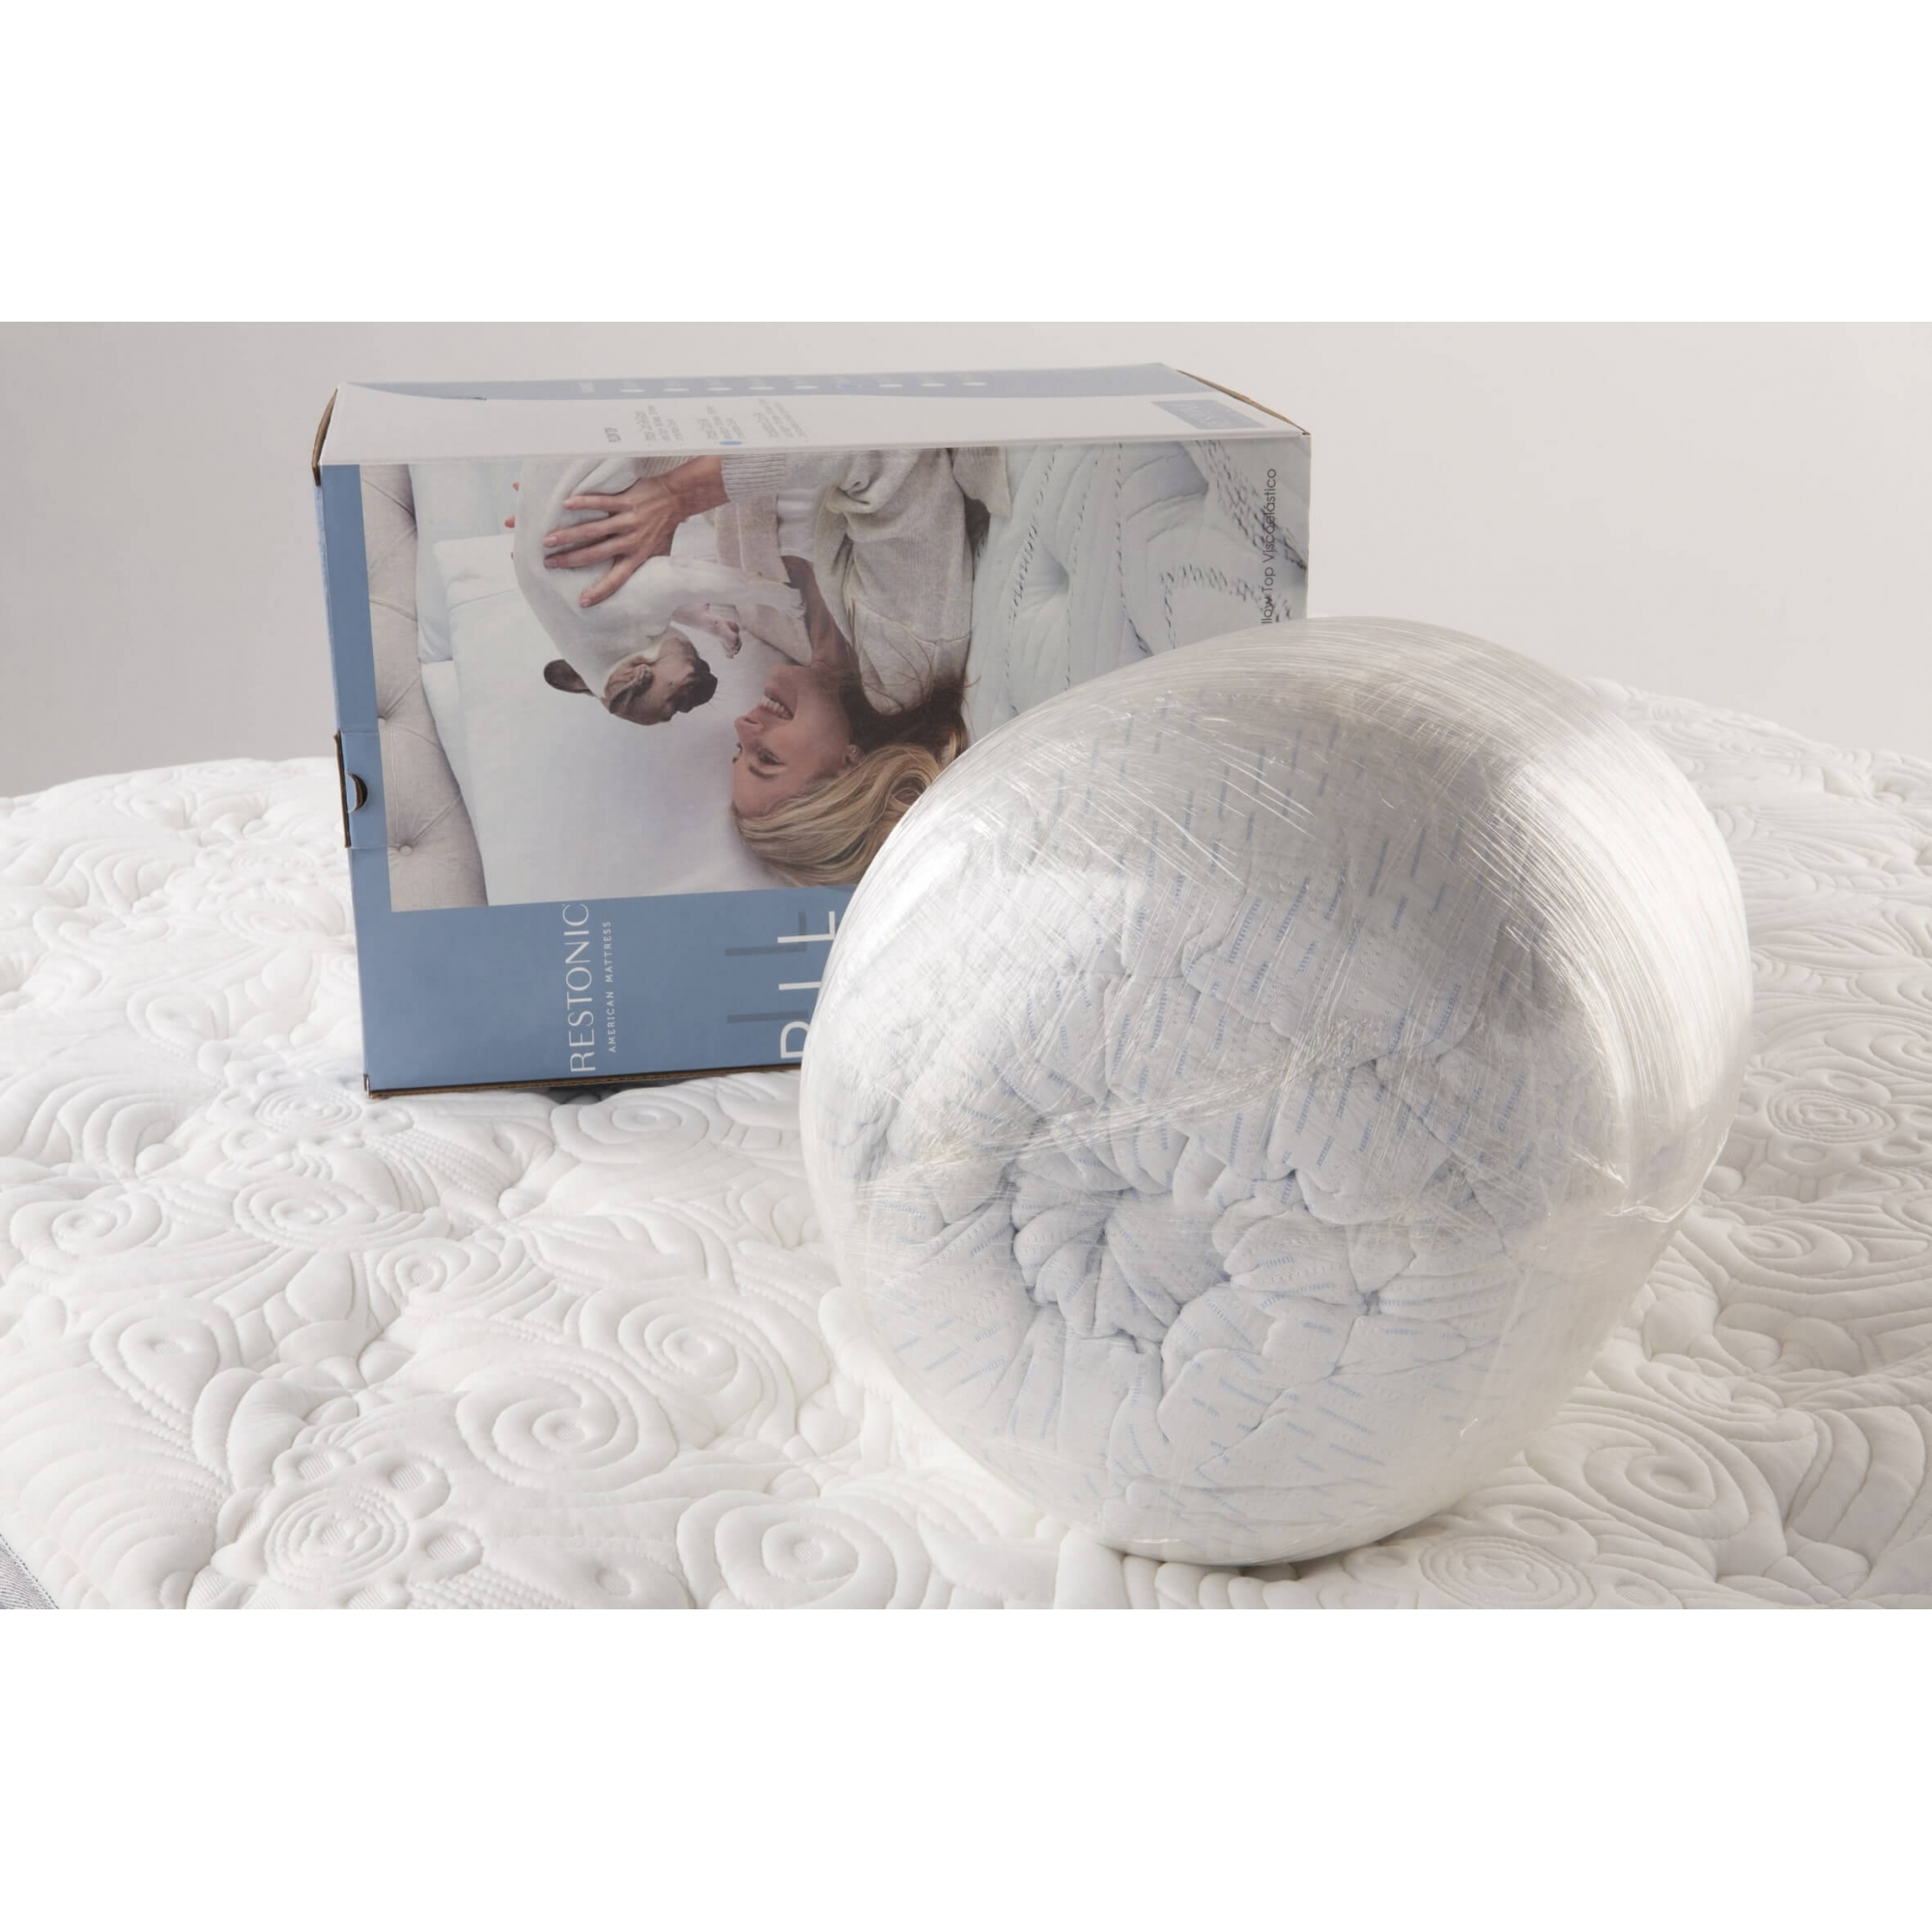 Pillow Top Restonic  Visco Coolgelpad Solteiro 0,88x1,88x4 Cm